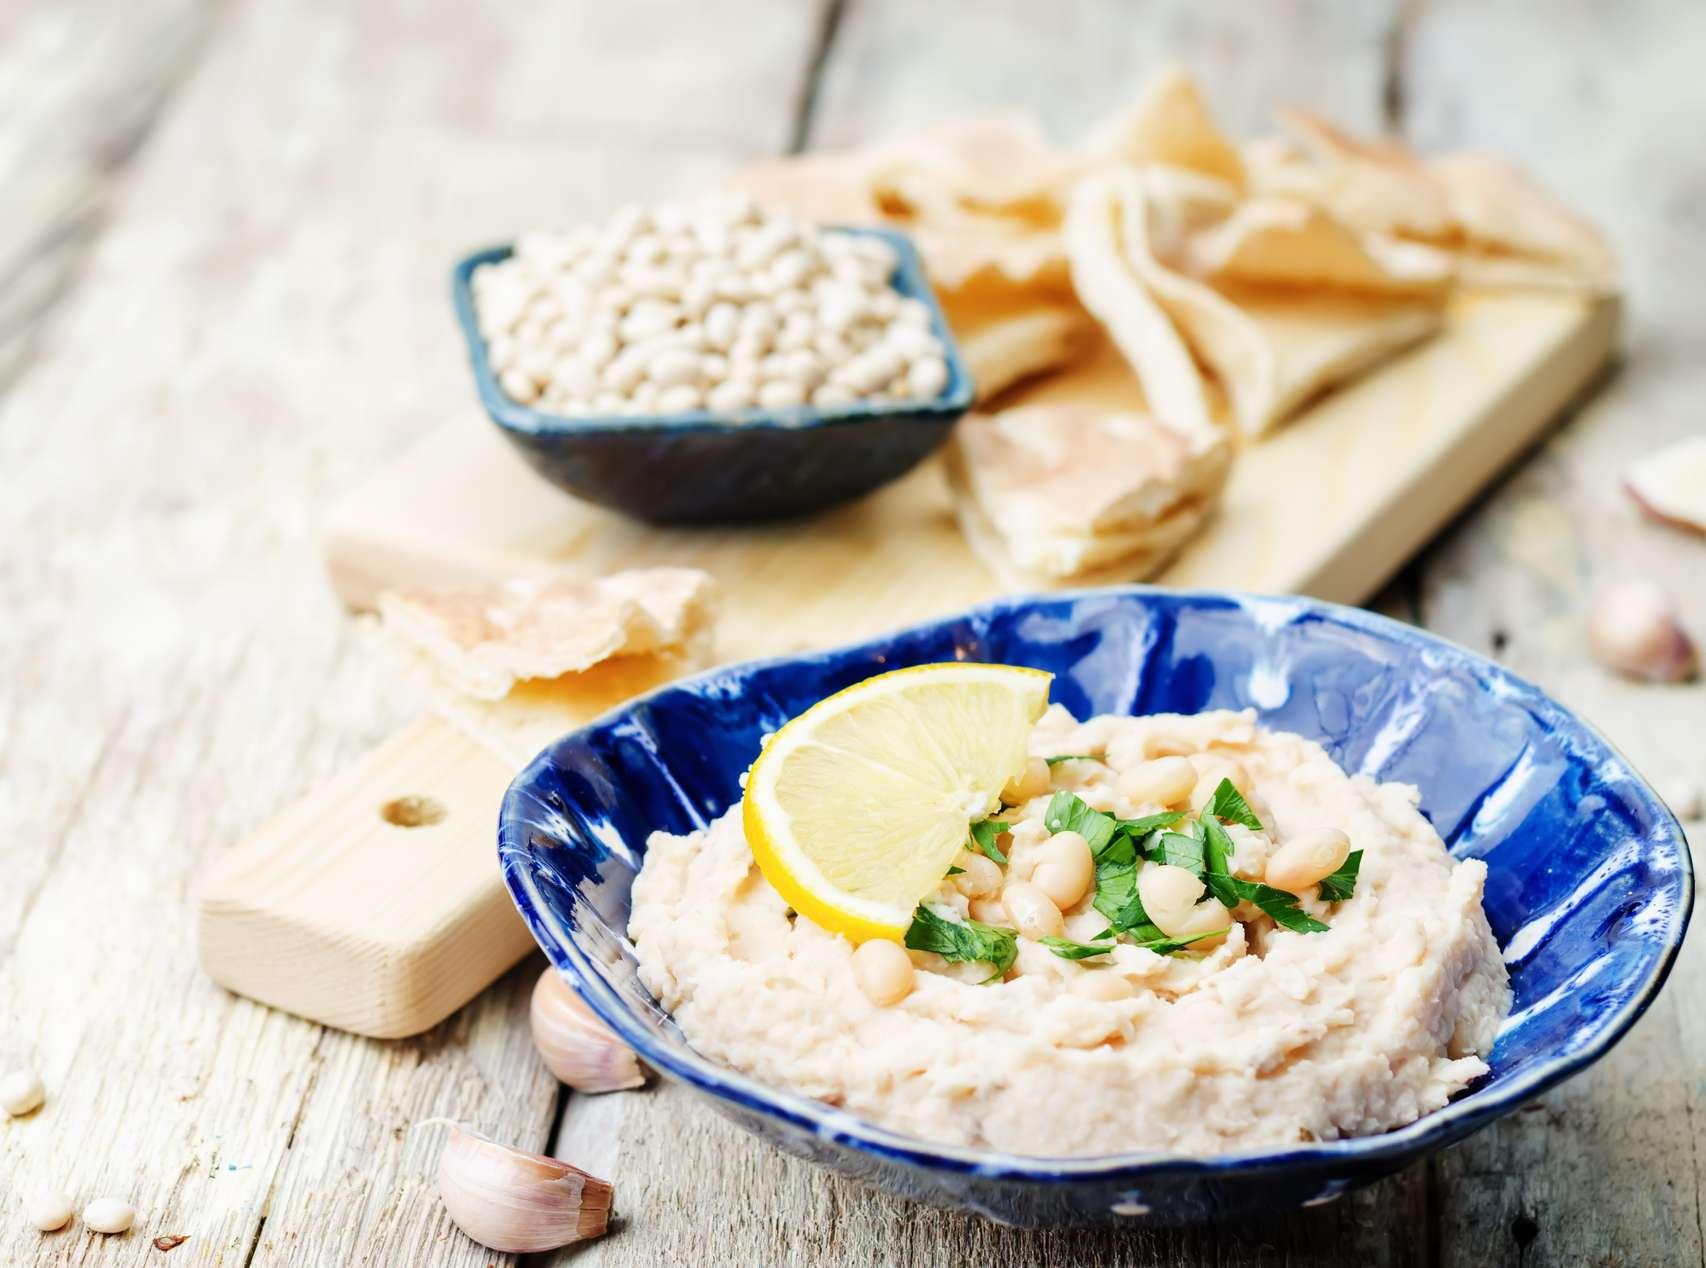 Vegan white bean spread